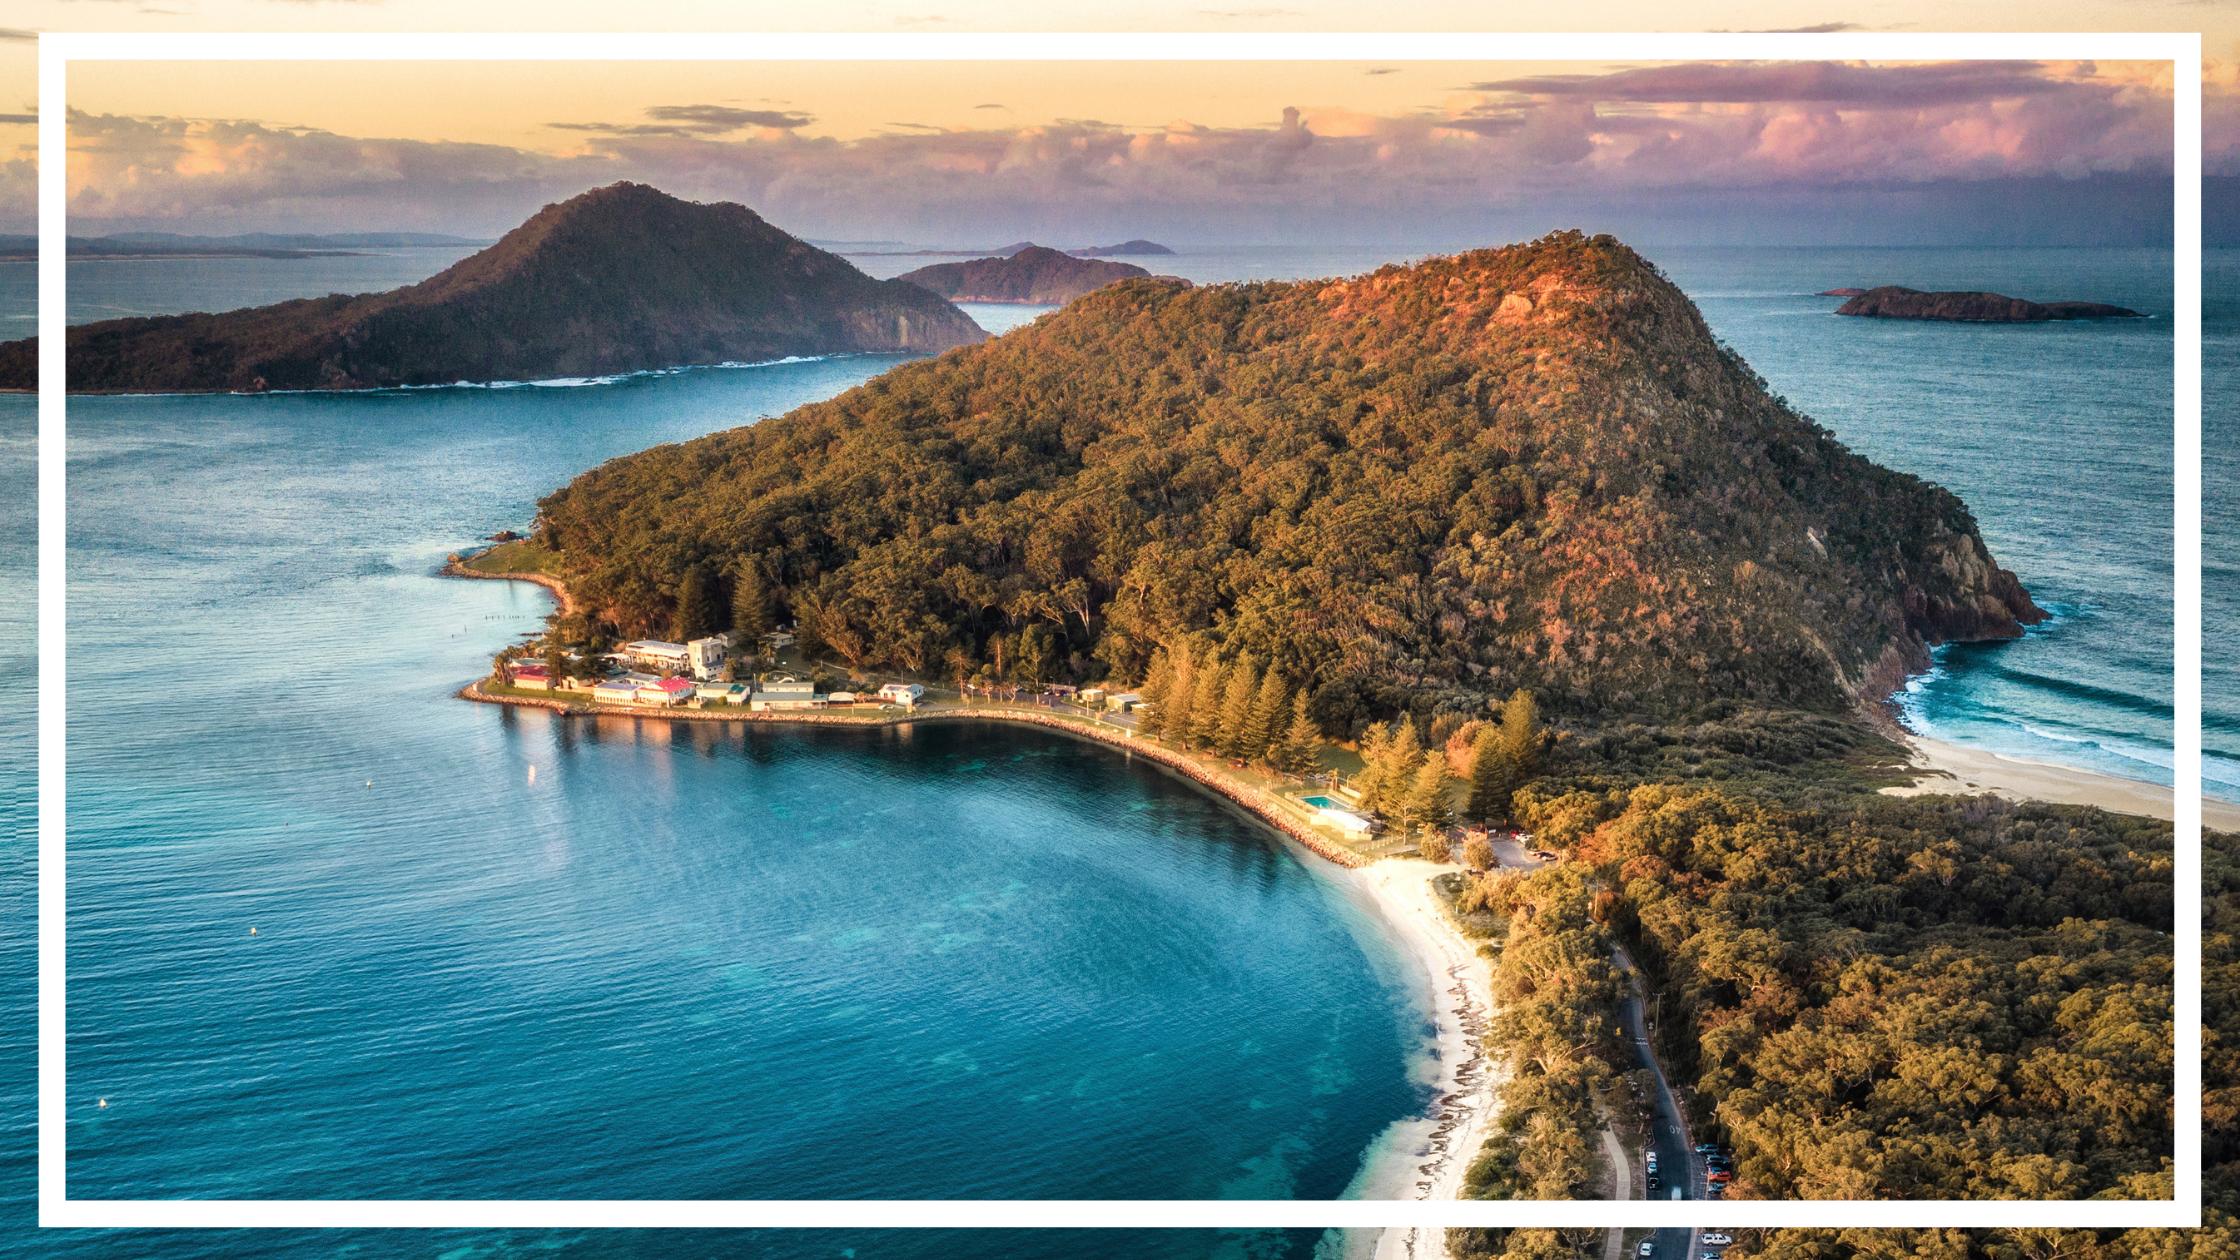 Tomaree Head, Port Stephens by Destination NSW